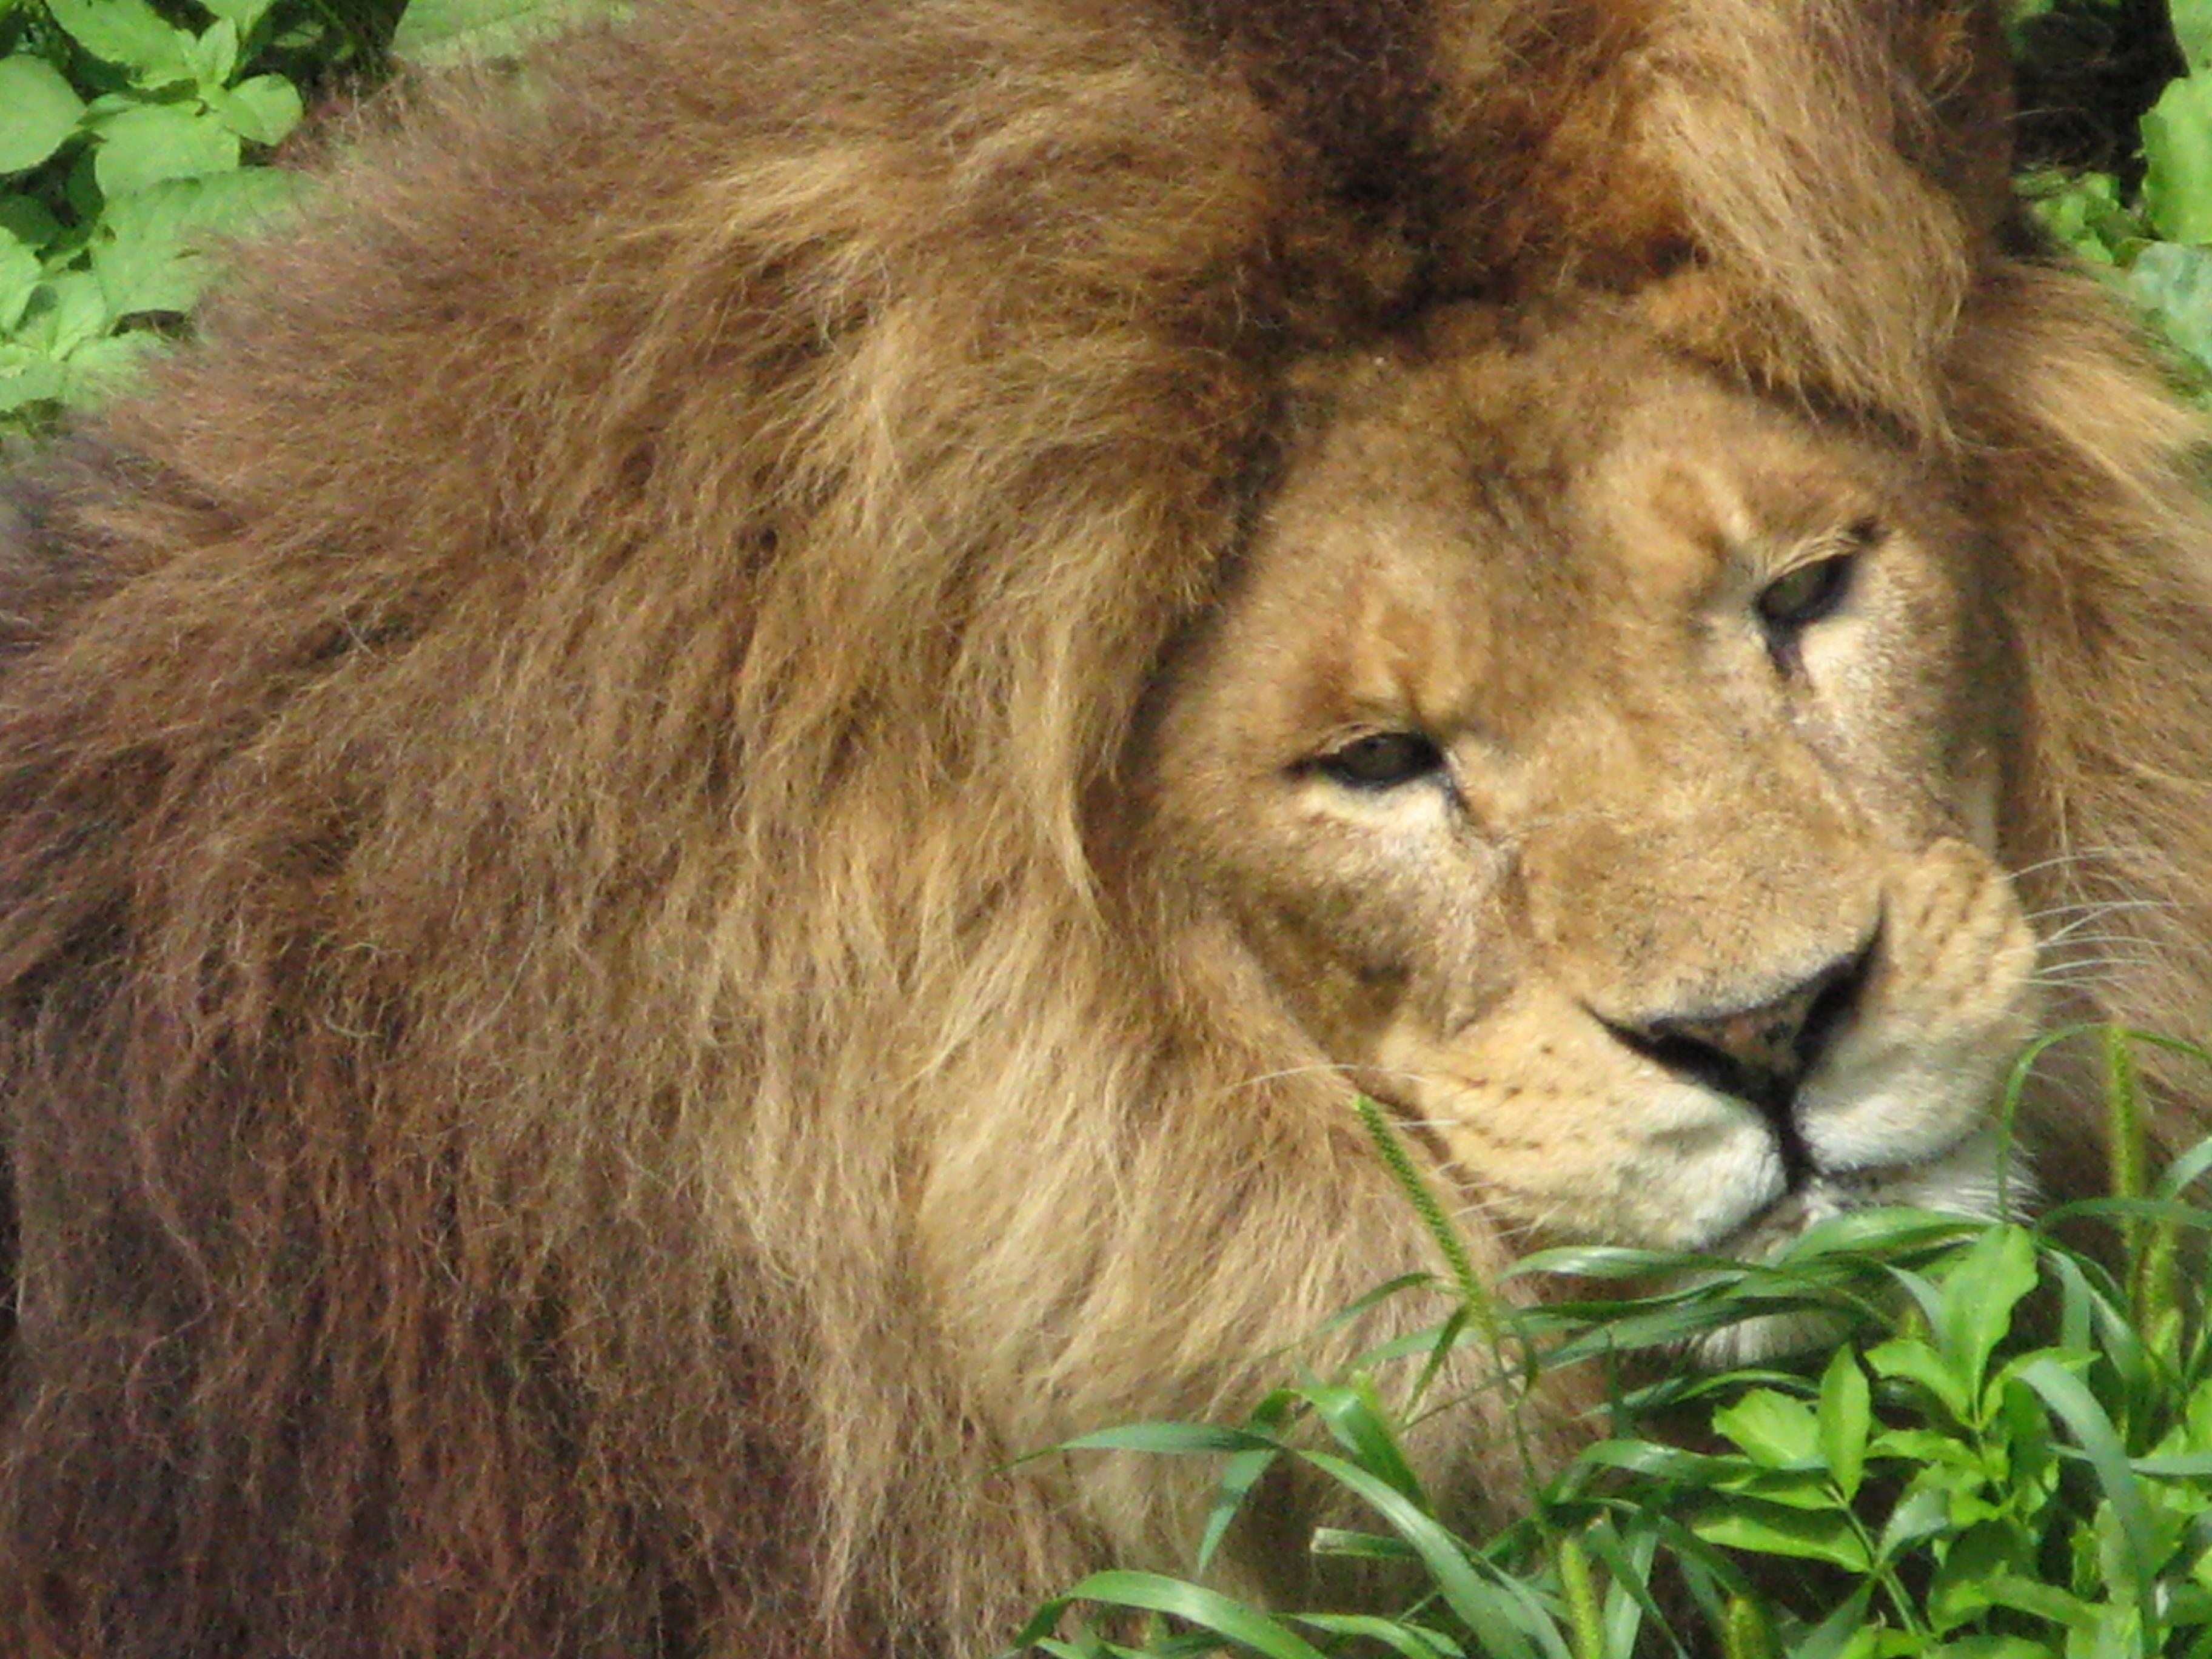 Lion Closeup, Animal, Close, Closeup, Fierce, HQ Photo